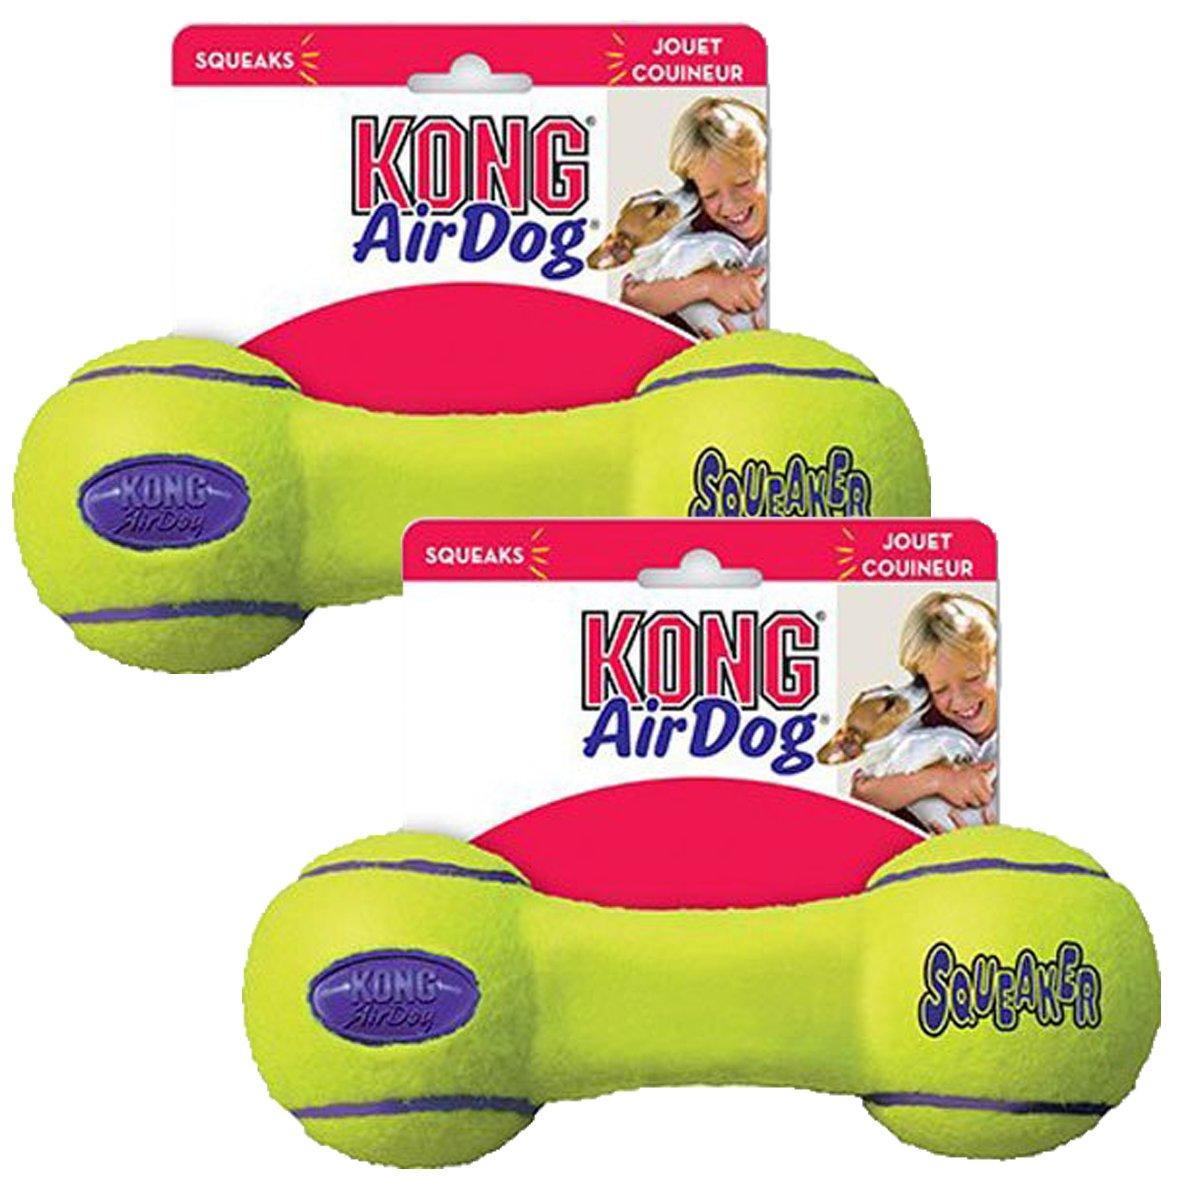 Medium 2 Pack KONG Air Dog Squeaker Dog Toy